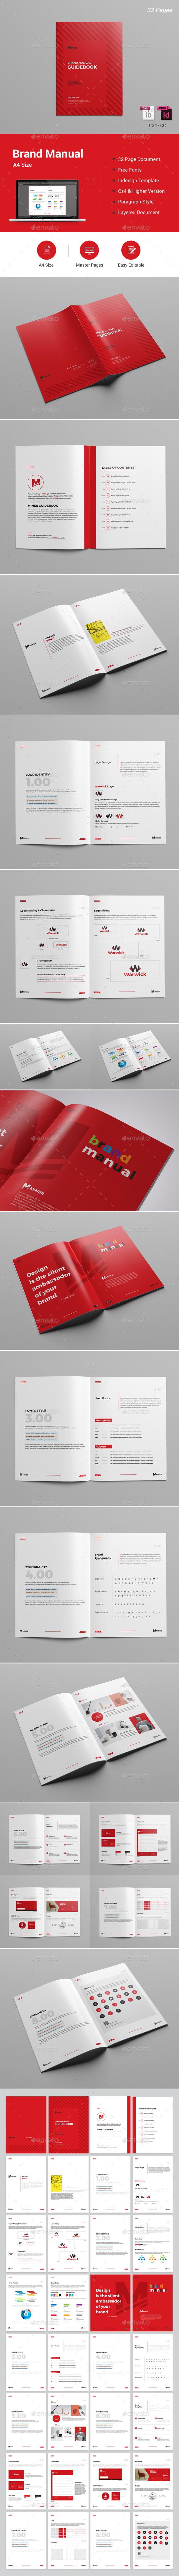 GraphicRiver Brand Manual 20327993